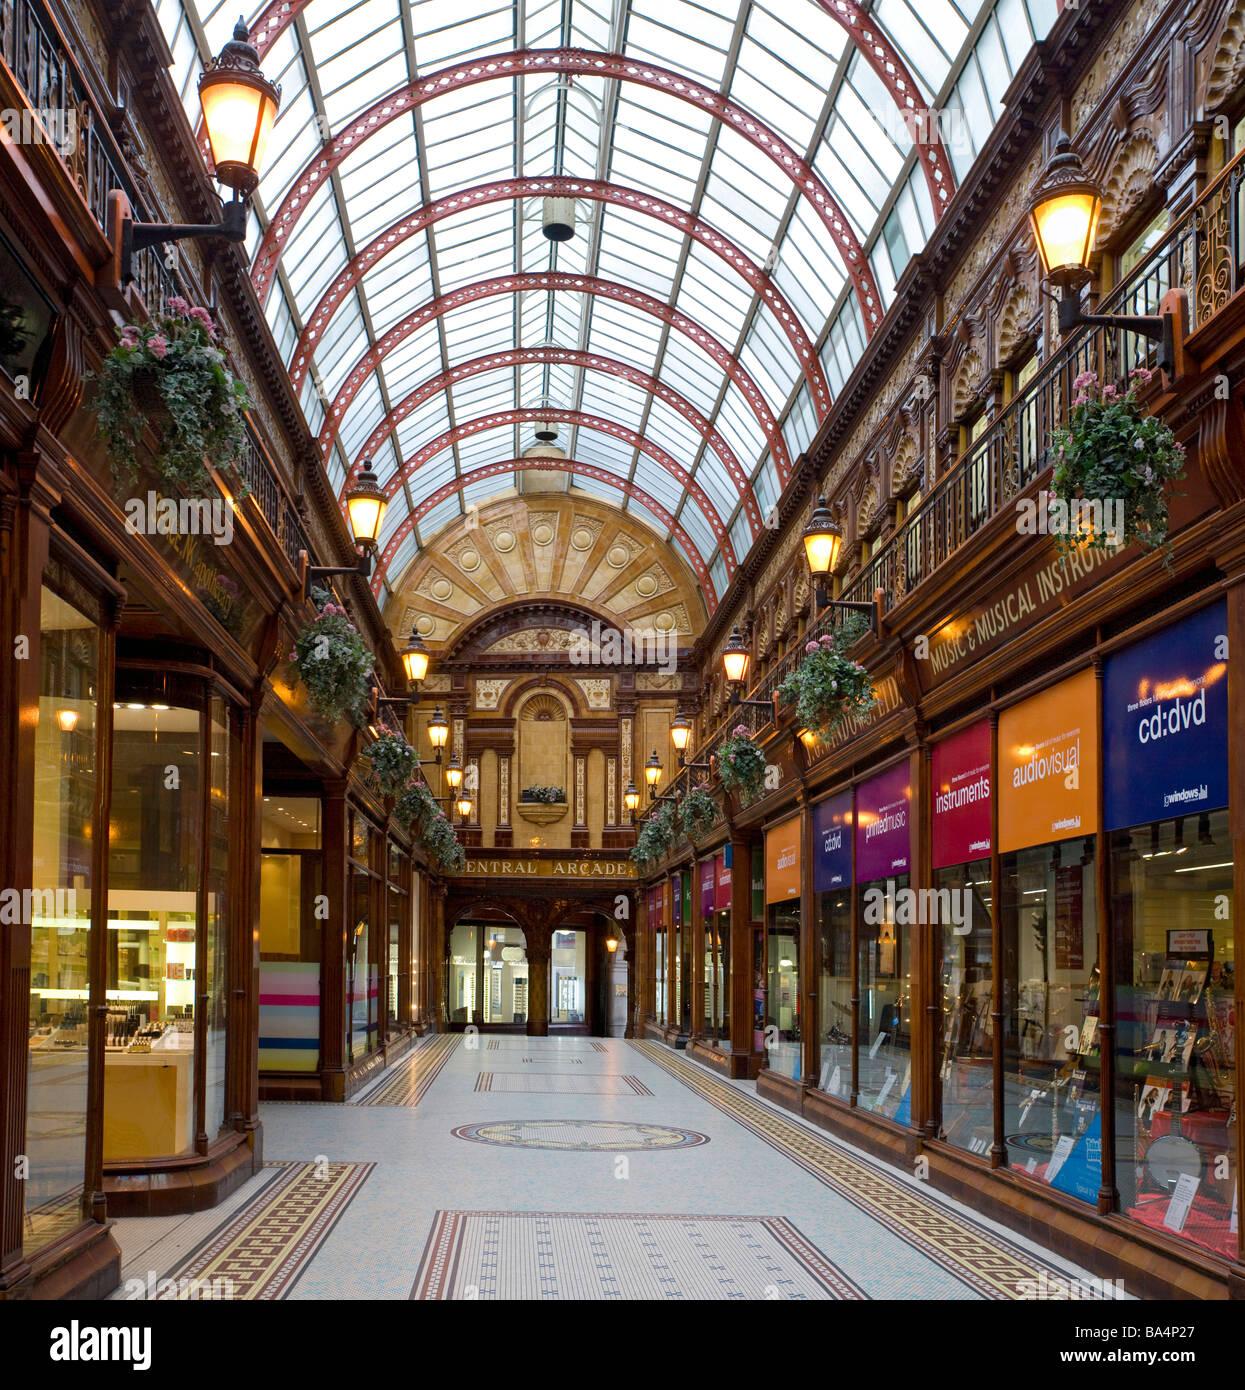 Central arcade shopping centre, Newcastle, Gateshead, England. - Stock Image